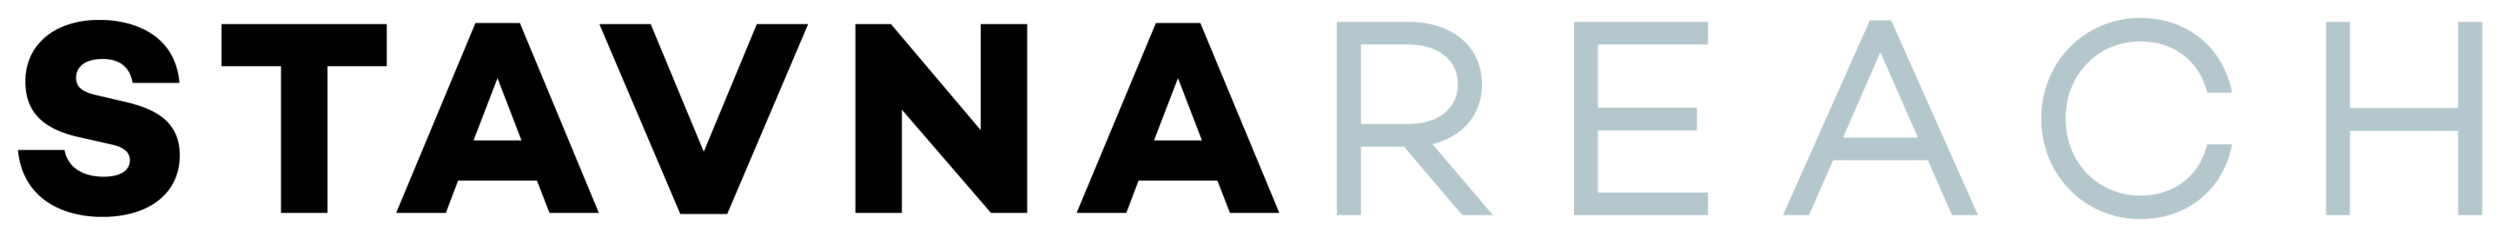 SB_Reach_horizontal-logo.png